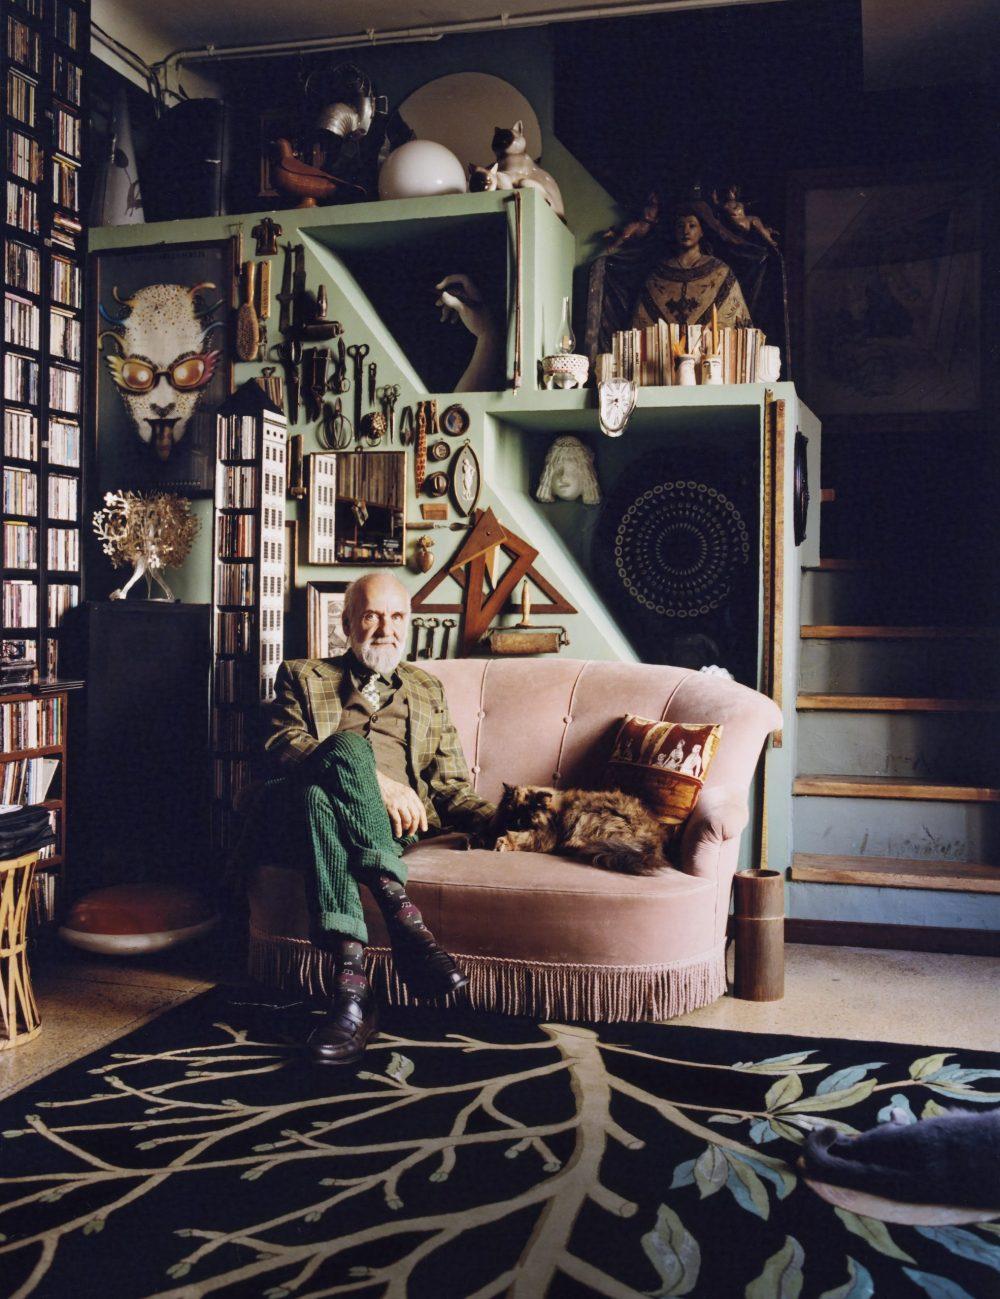 Barnada Fornasetti tại Casa Fornasetti. Ảnh: rivistastudio.com.